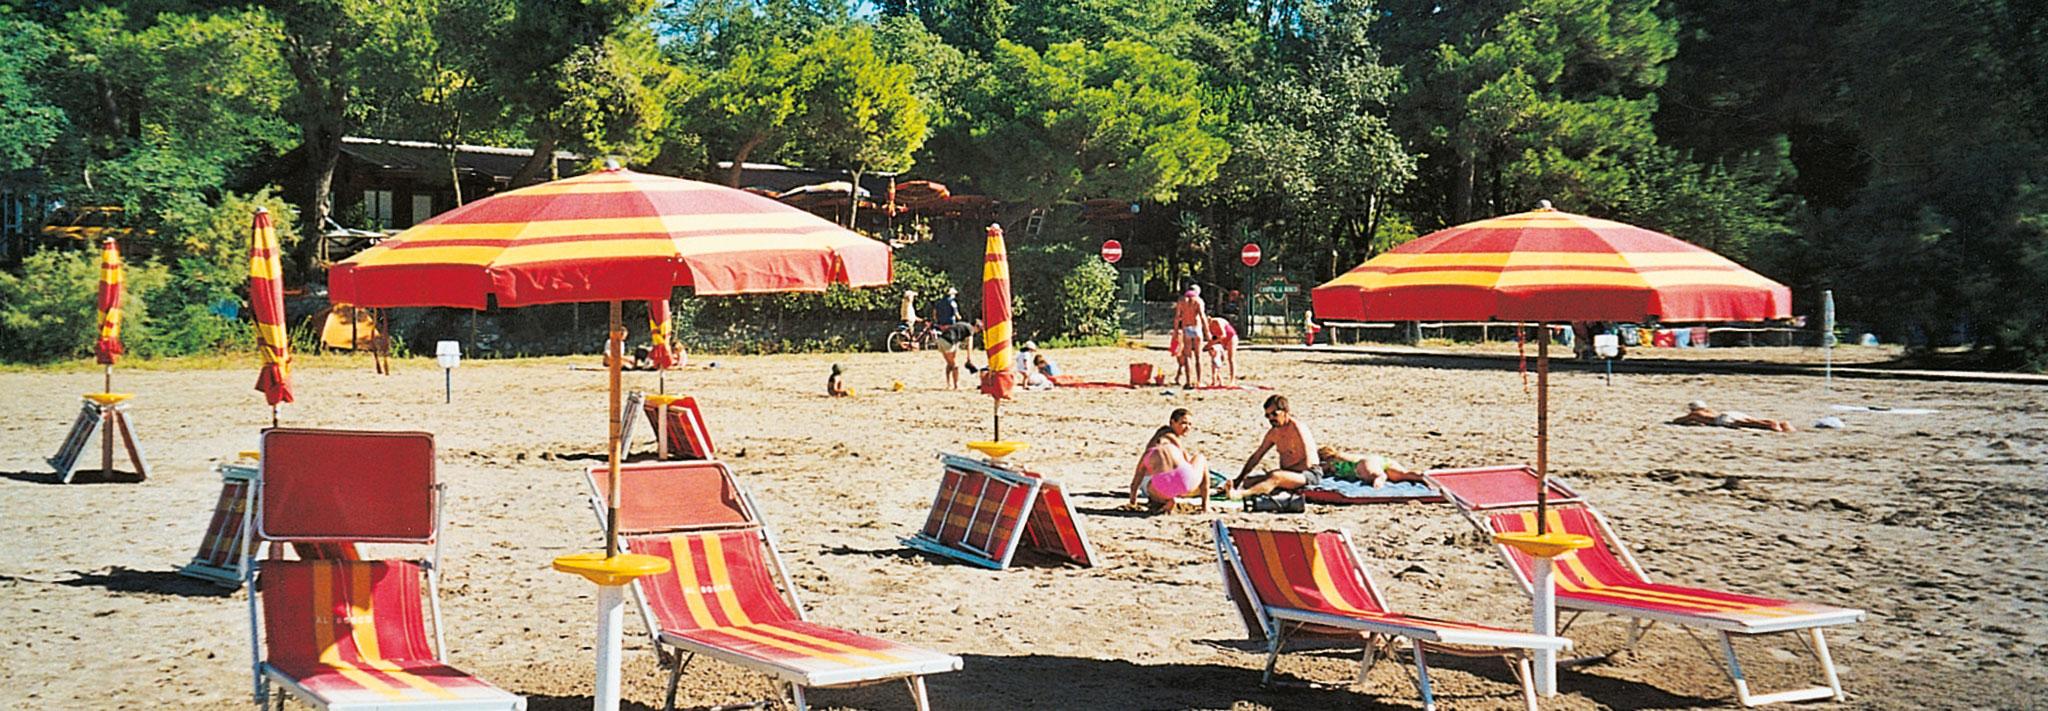 campingalbosco_headerbild_3